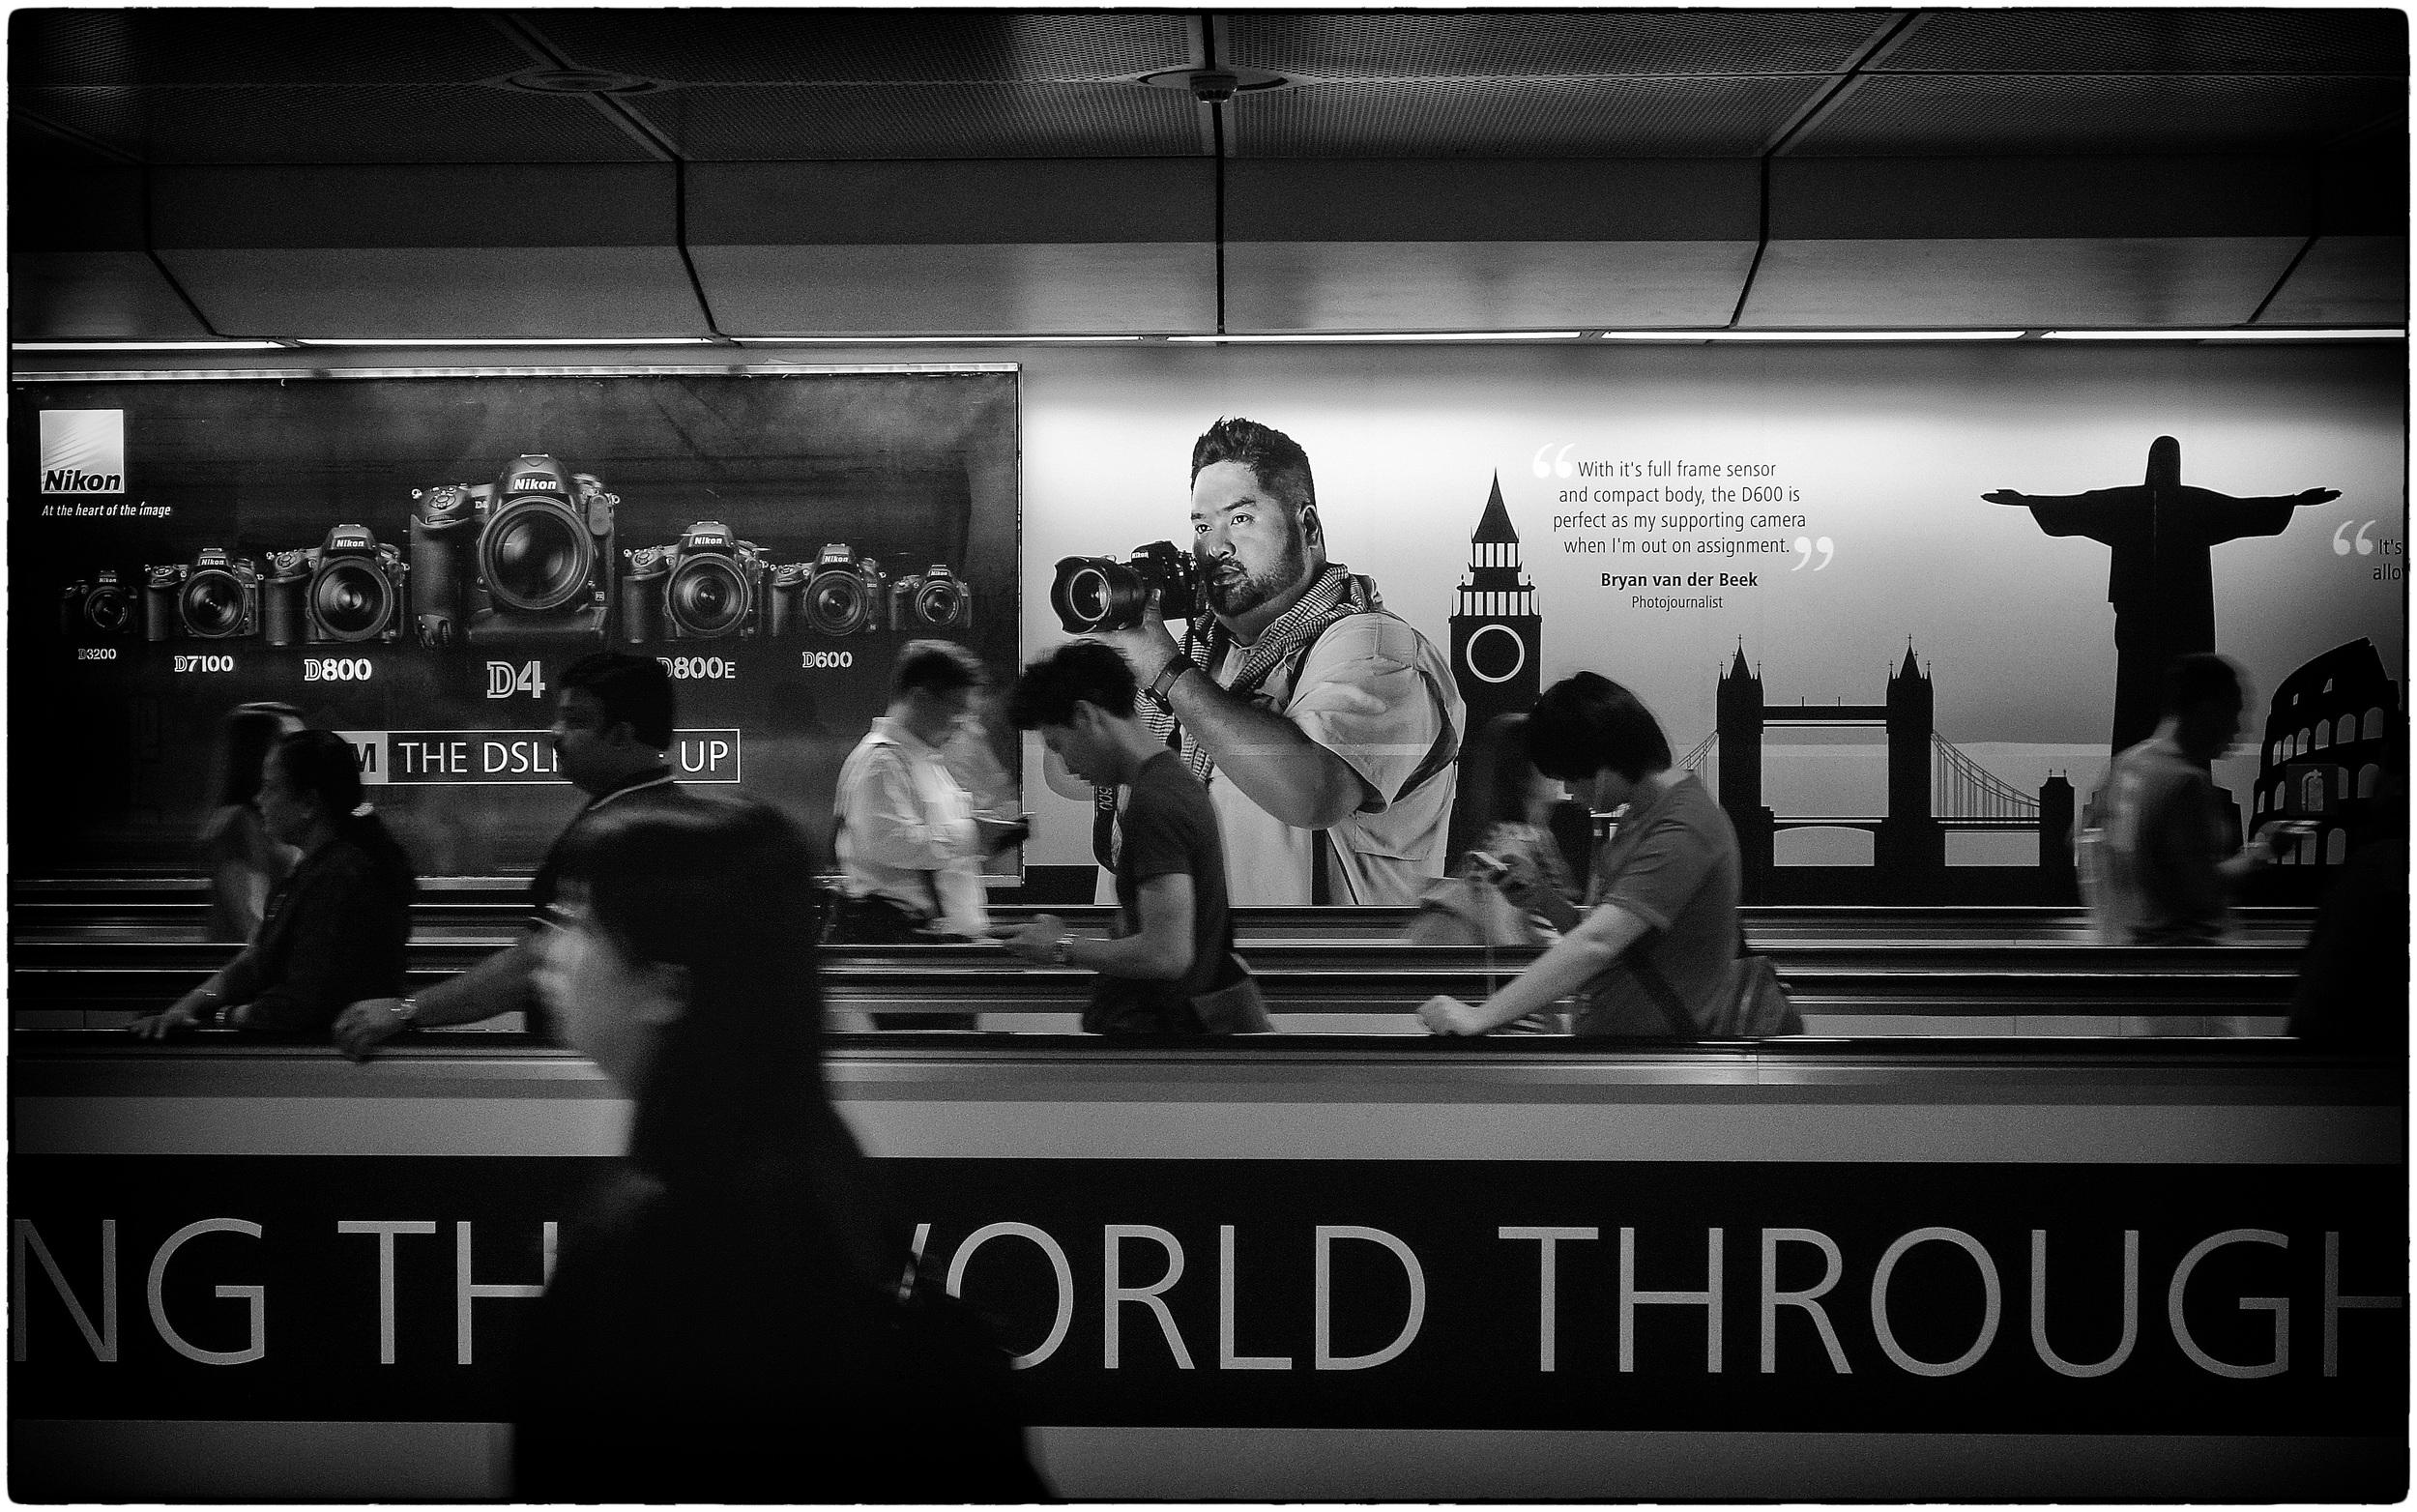 Seen at Dhoby Ghaut MRT Interchange in Singapore